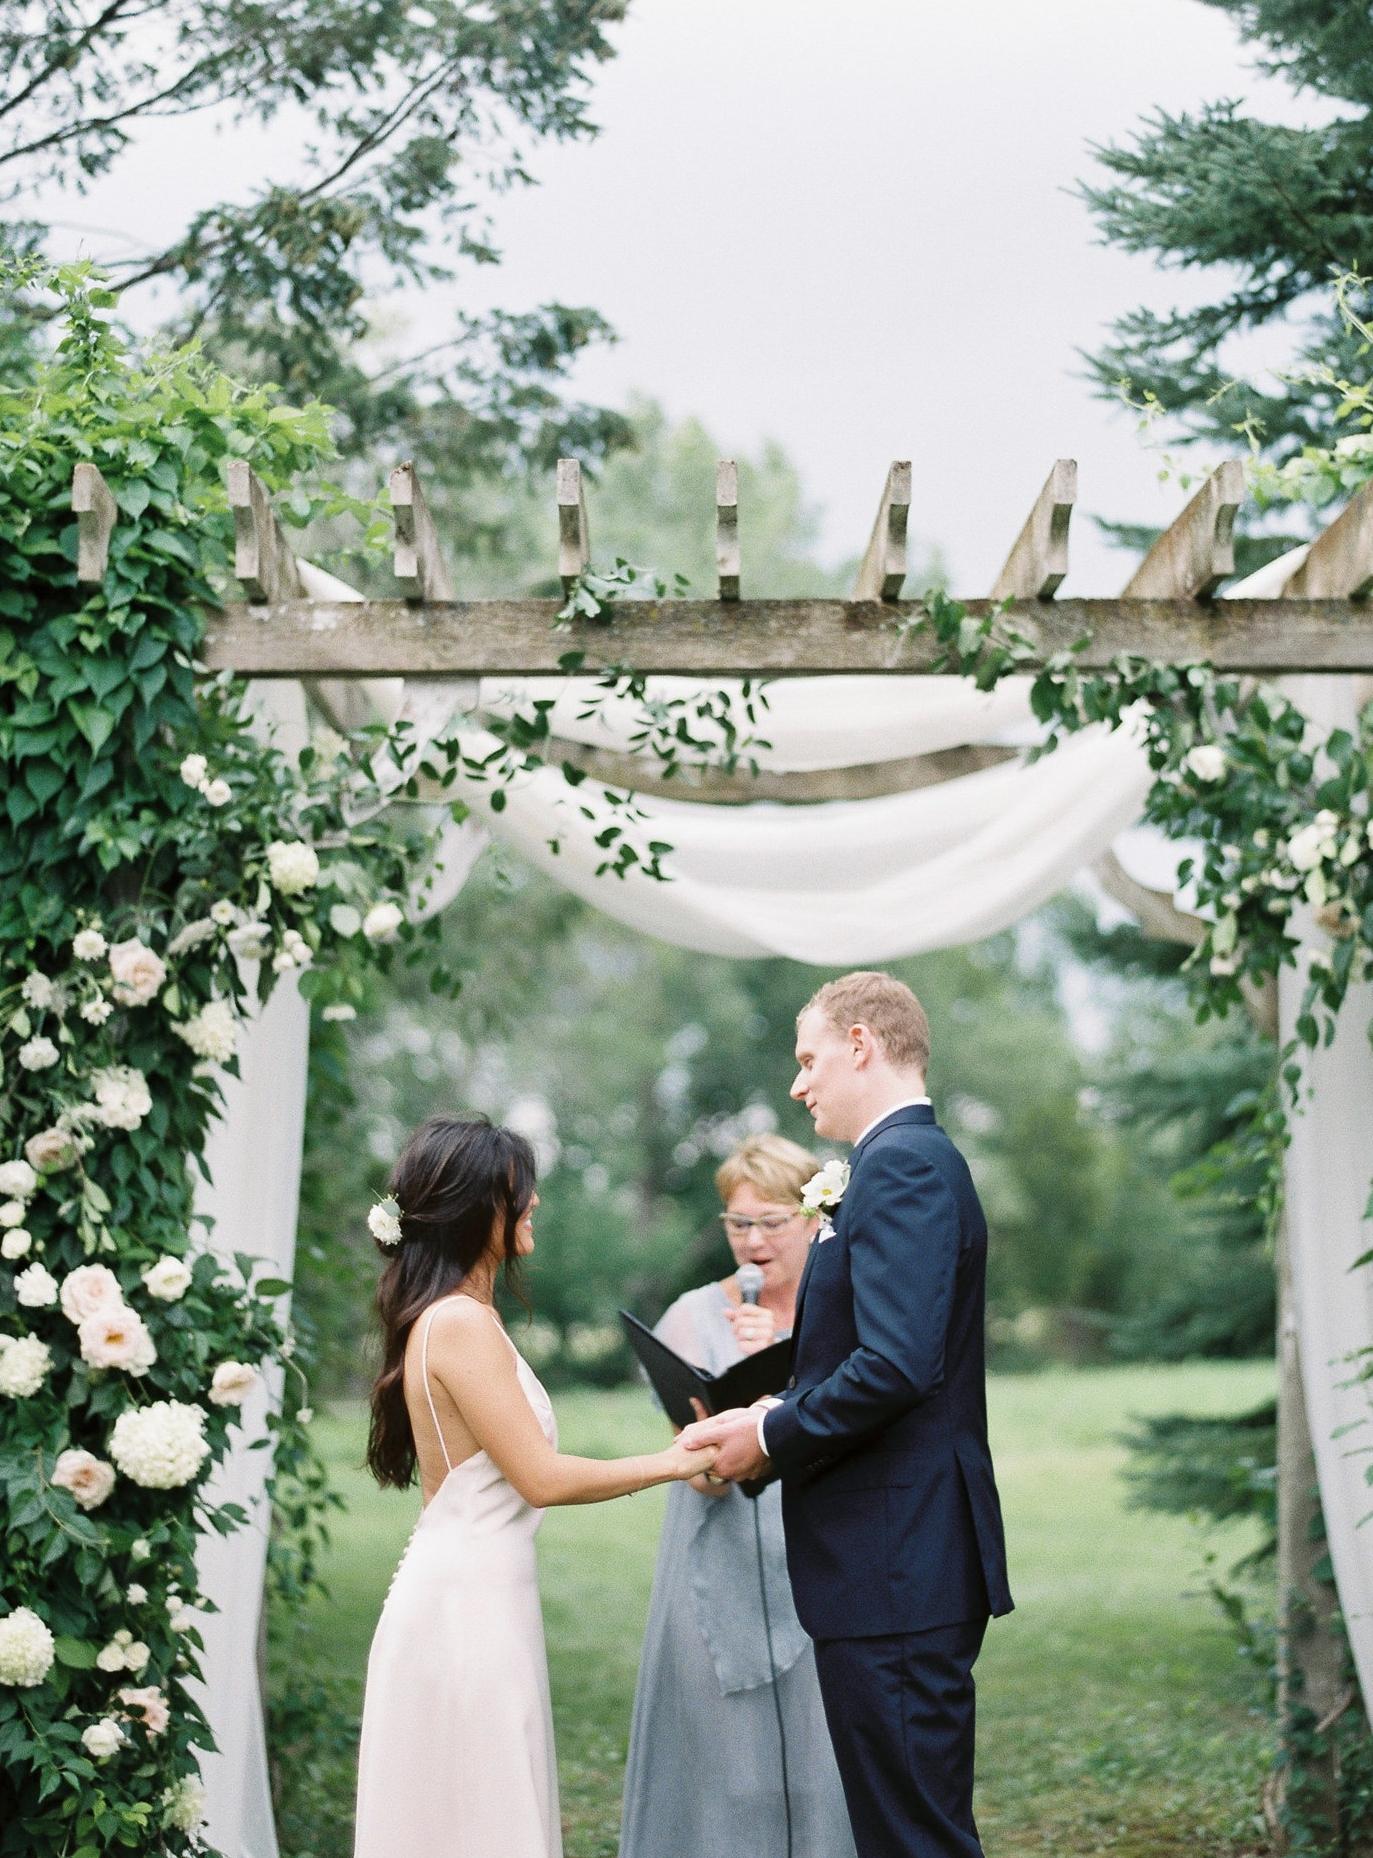 toronto-niagara-minimal-bloom-co-wedding-photographer-richelle-hunter-nicola-prentis-863.jpg